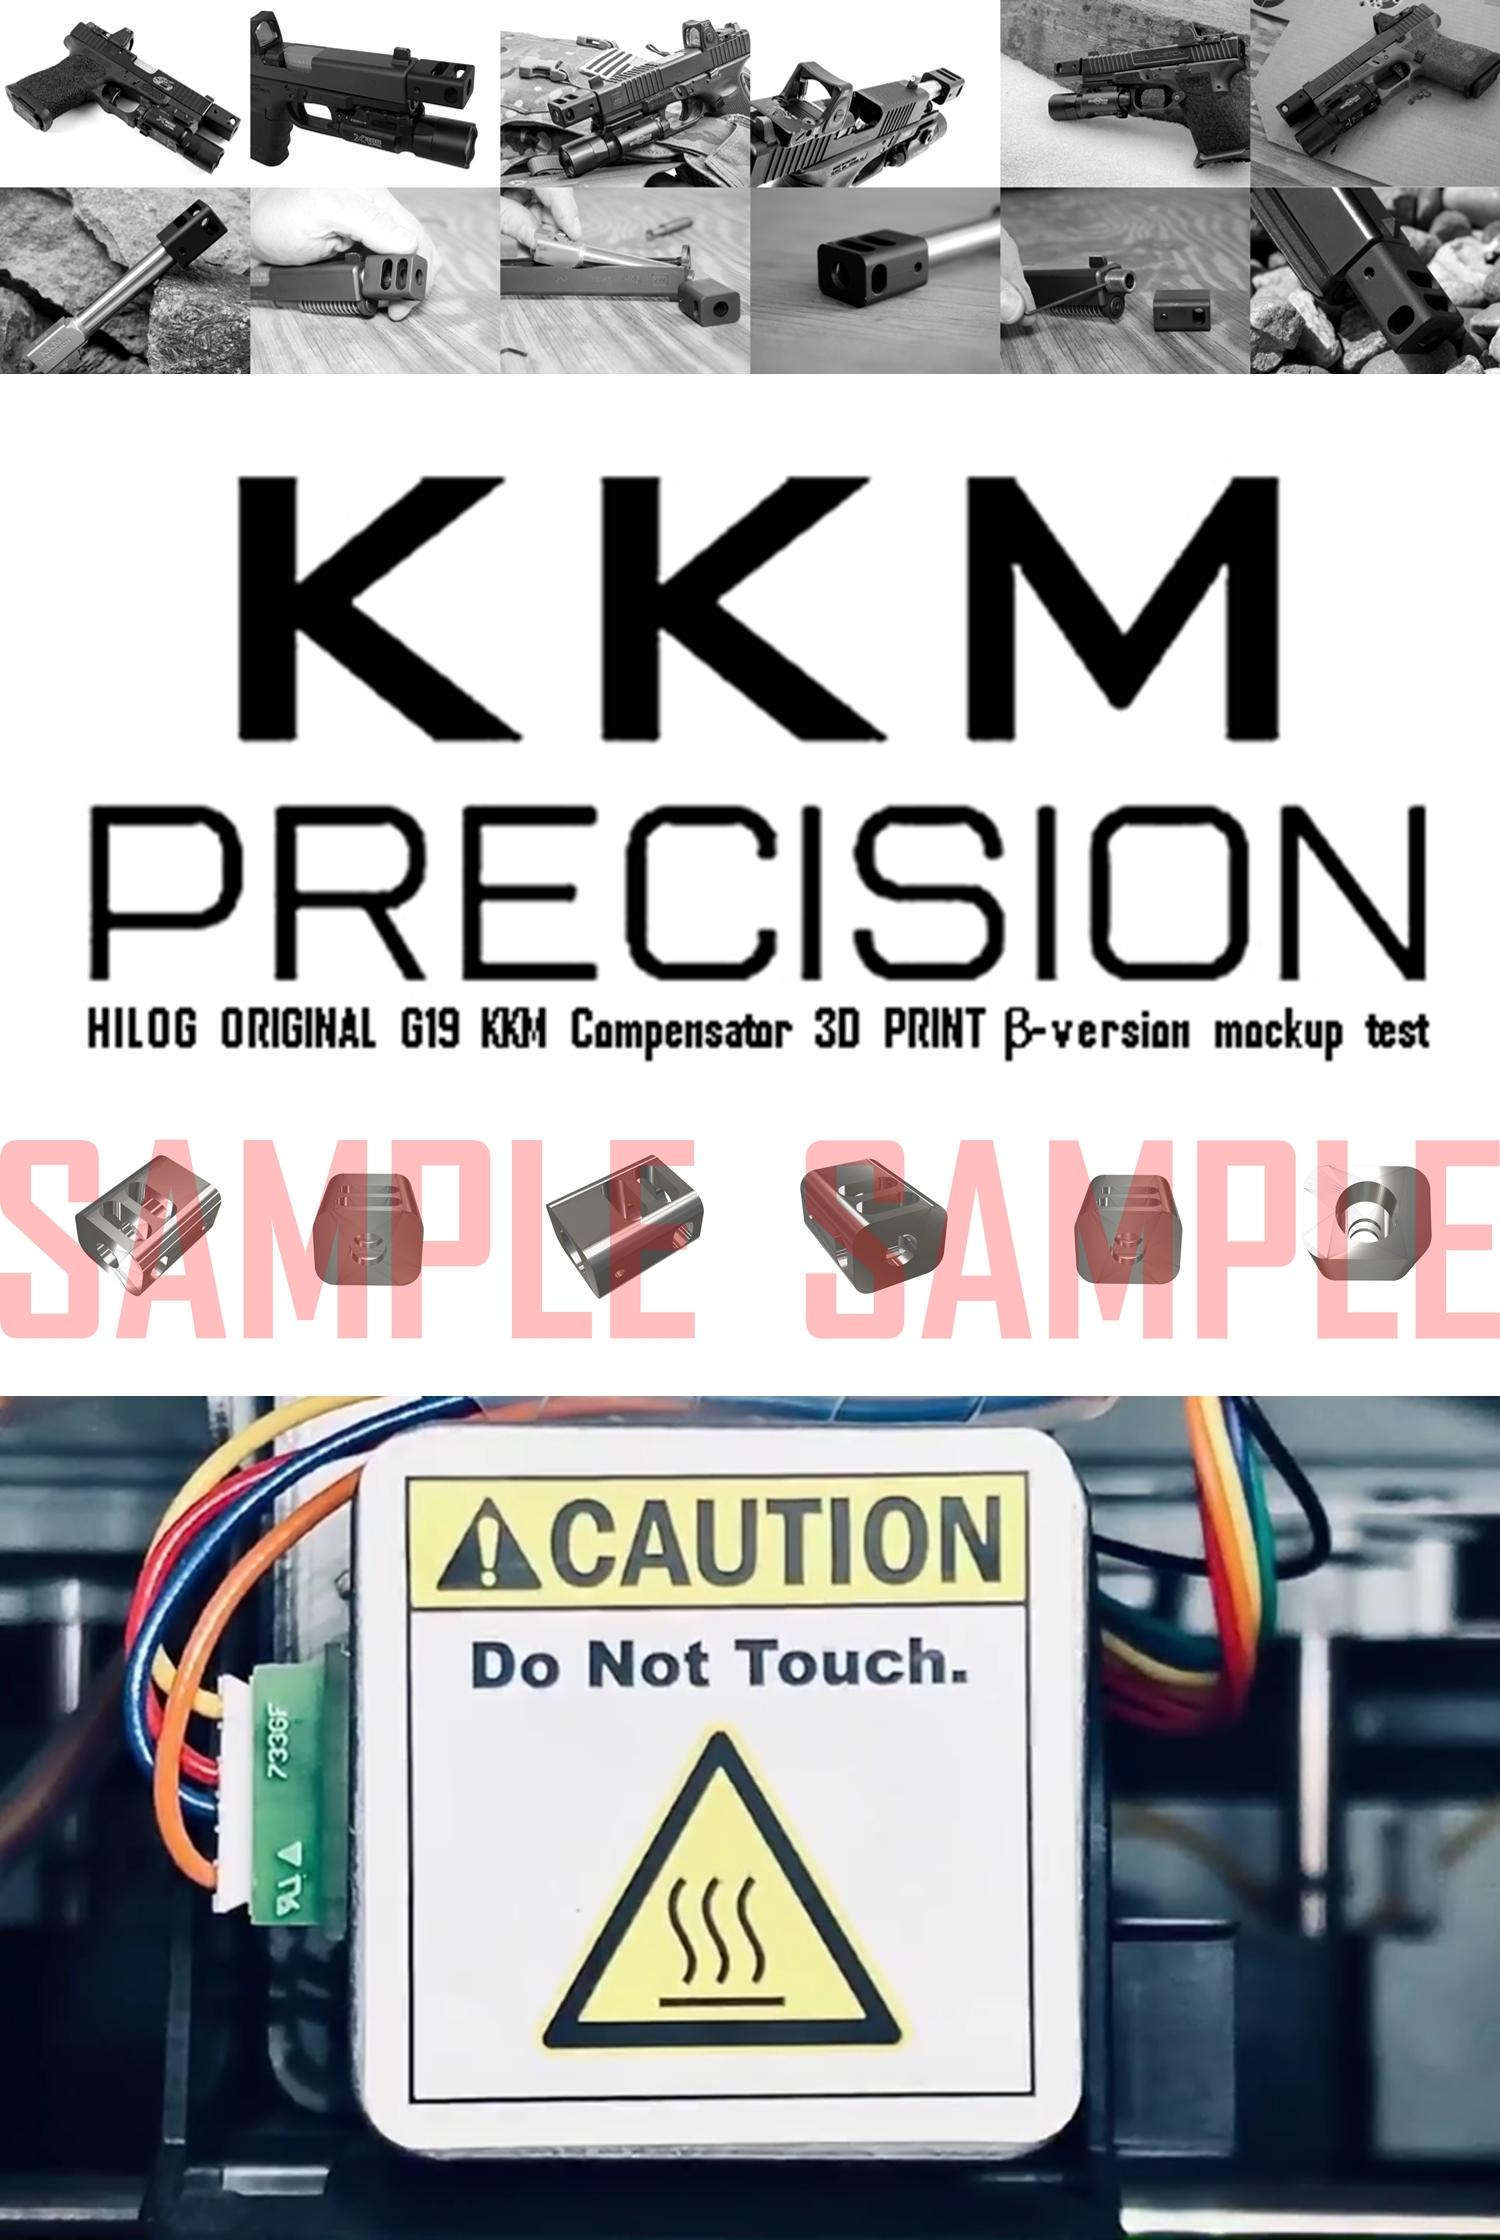 11 KKM MATCH BARREL + PROTECTOR KJ WORKS G19 TYPE & COMPENSATOR β-VERSION HILOG ORIGINAL 3D MOCKUP!! 『SUPDEFG19』自力で作るぞ大作戦!! 最も重要なアウターバレル&コンペンセイターの準備は整った!! DIY サ